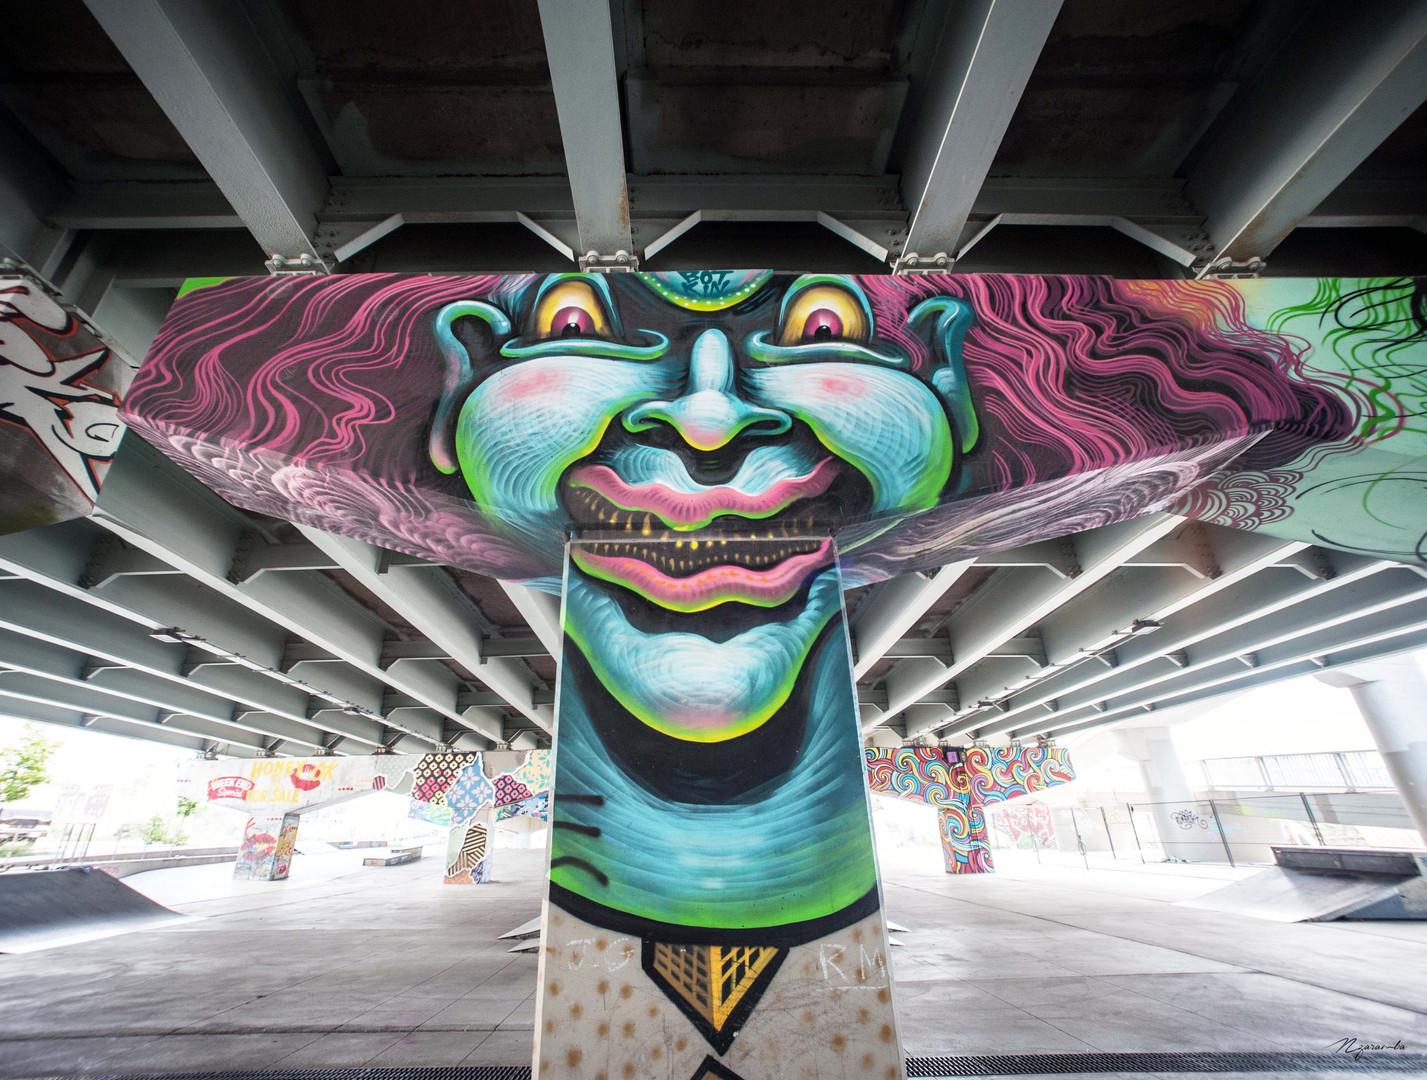 Unknown artist, Toronto, septembre 2017.